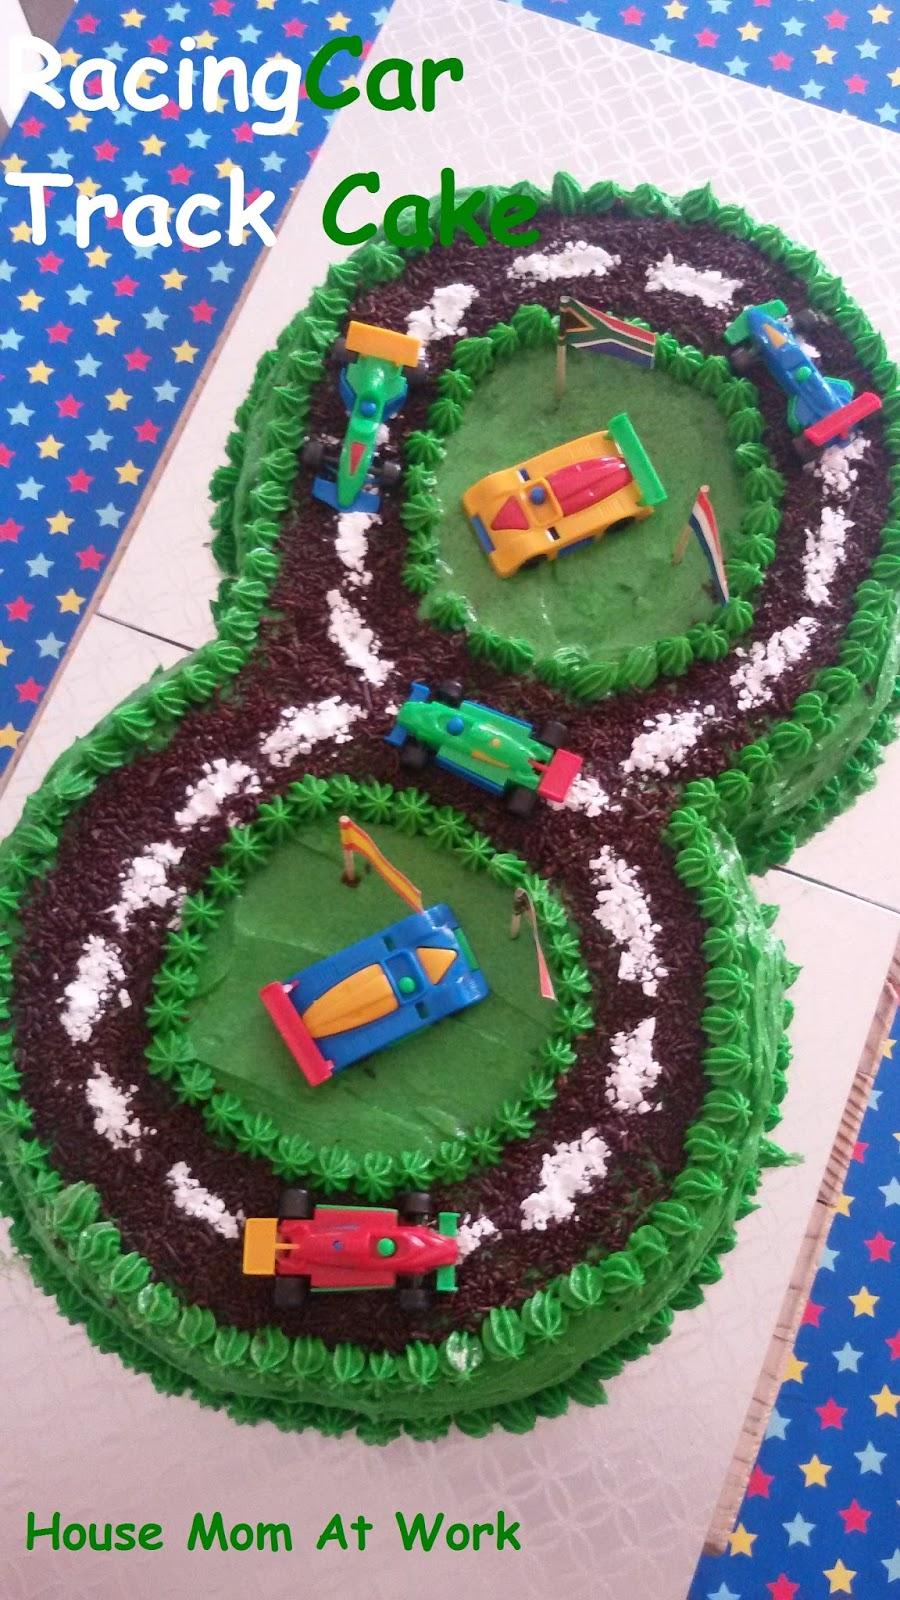 House Mom At Work Eggless Racing Car Track Cake